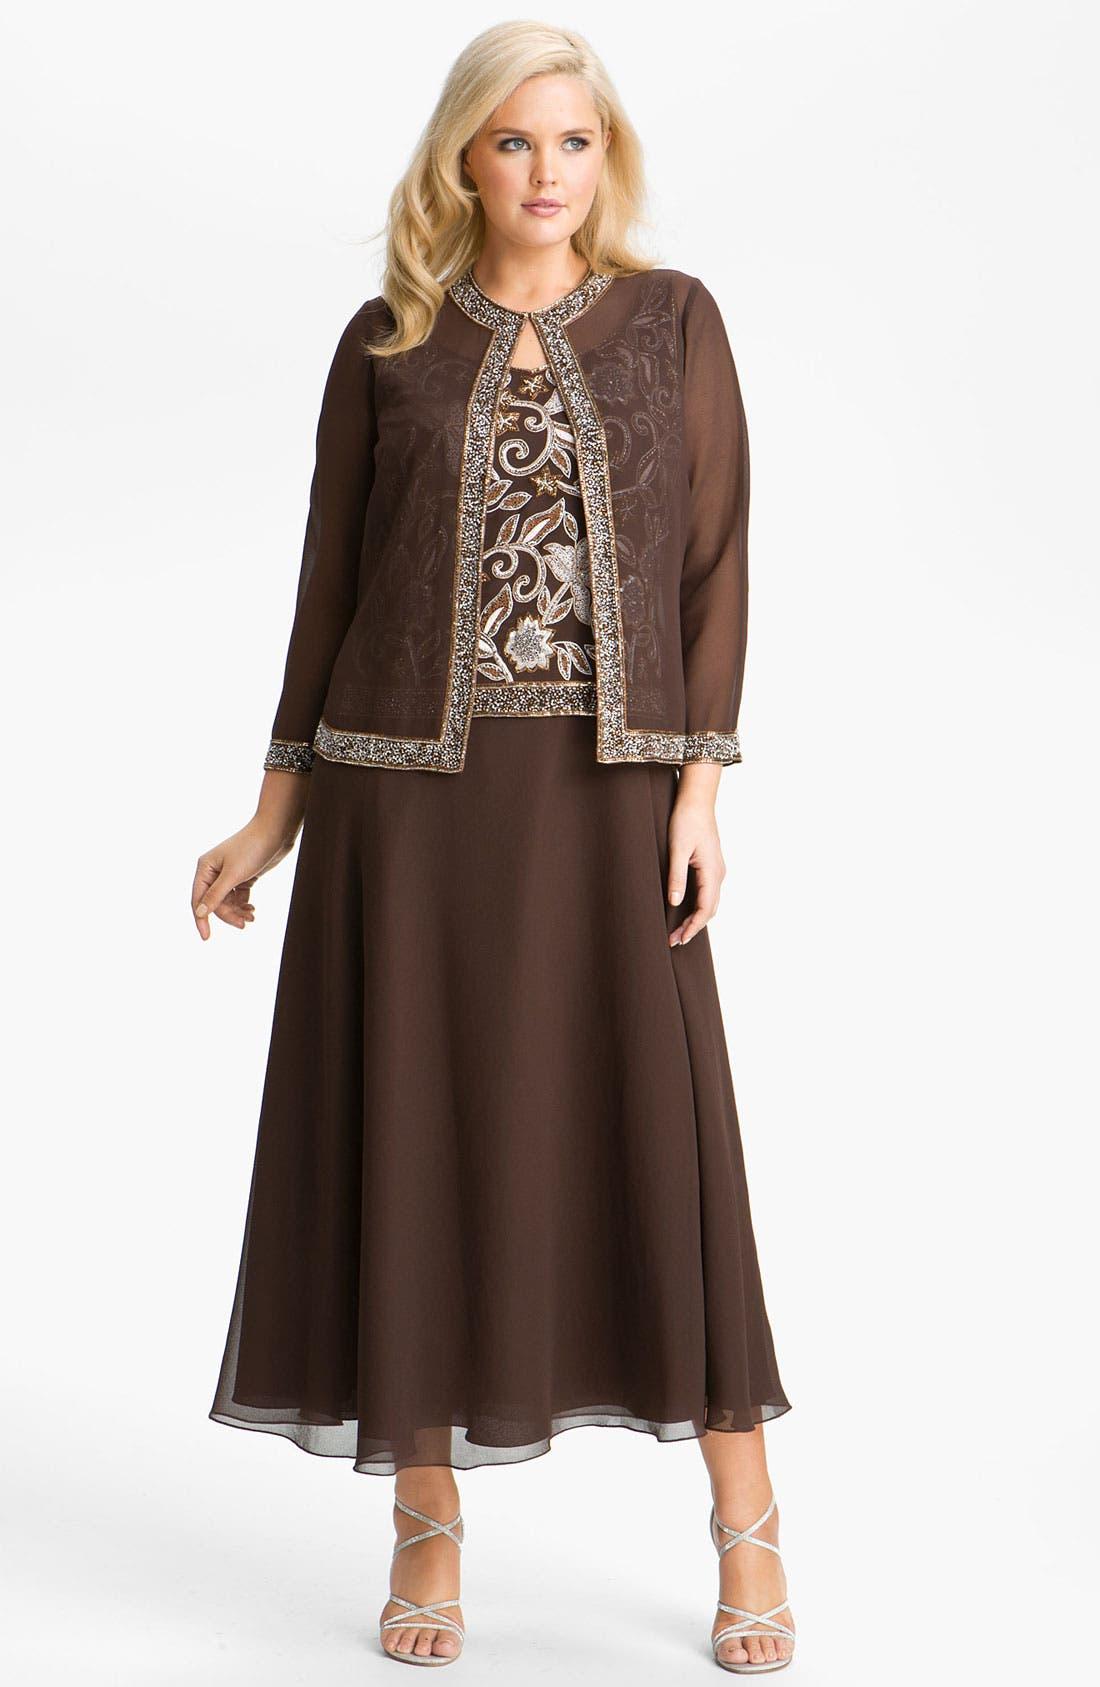 Alternate Image 1 Selected - J Kara Sheer Beaded Chiffon Gown with Jacket (Plus)